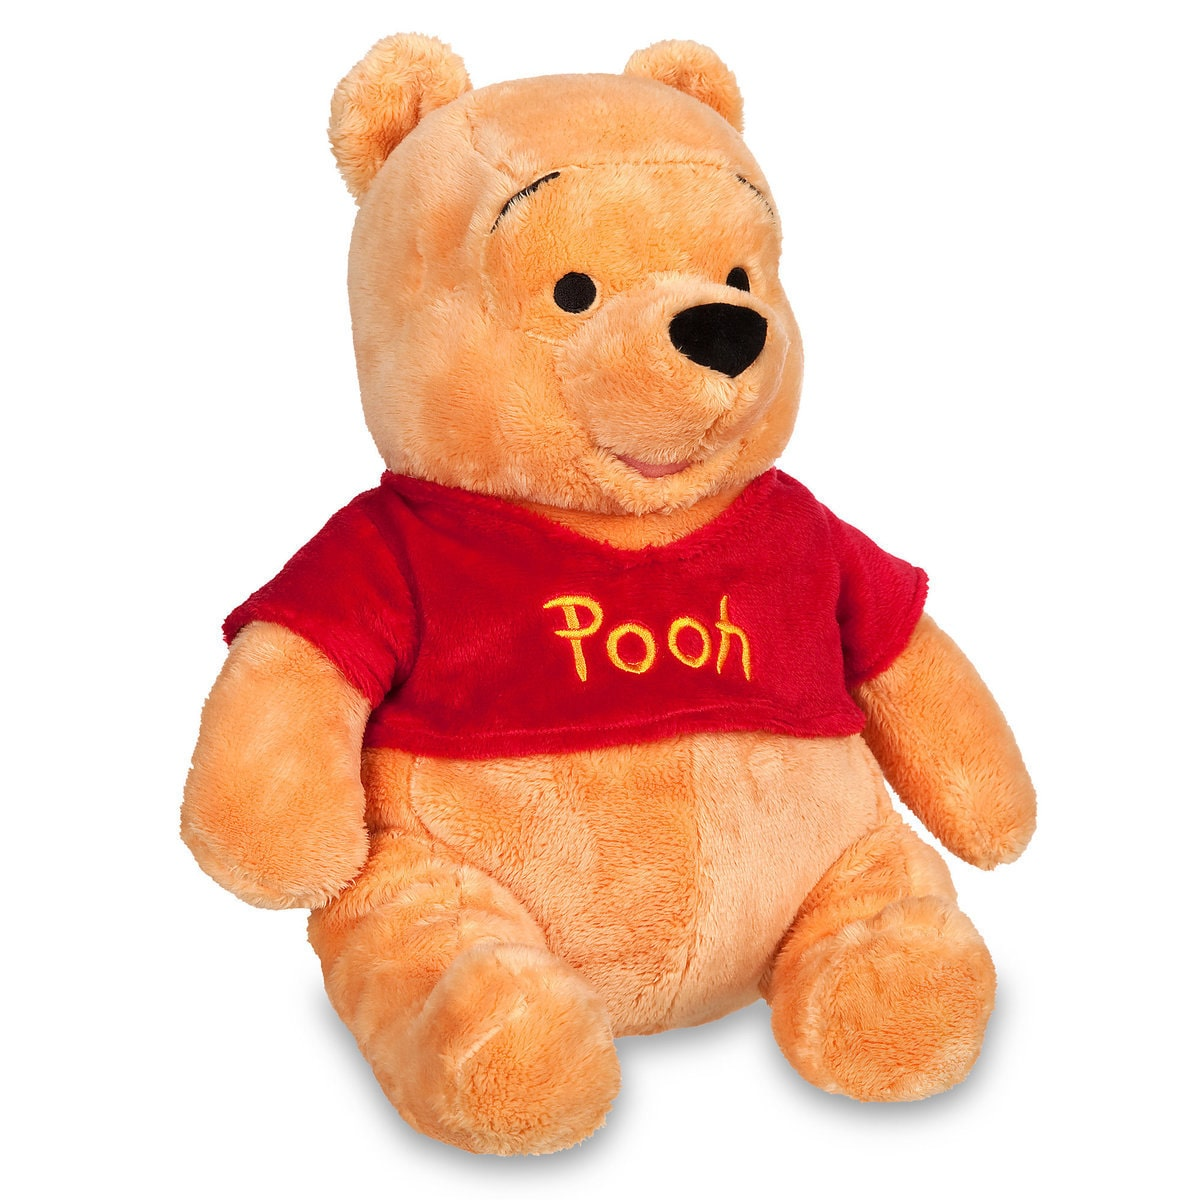 61a033b1ce2e Product Image of Winnie the Pooh Plush - Medium - 14     1